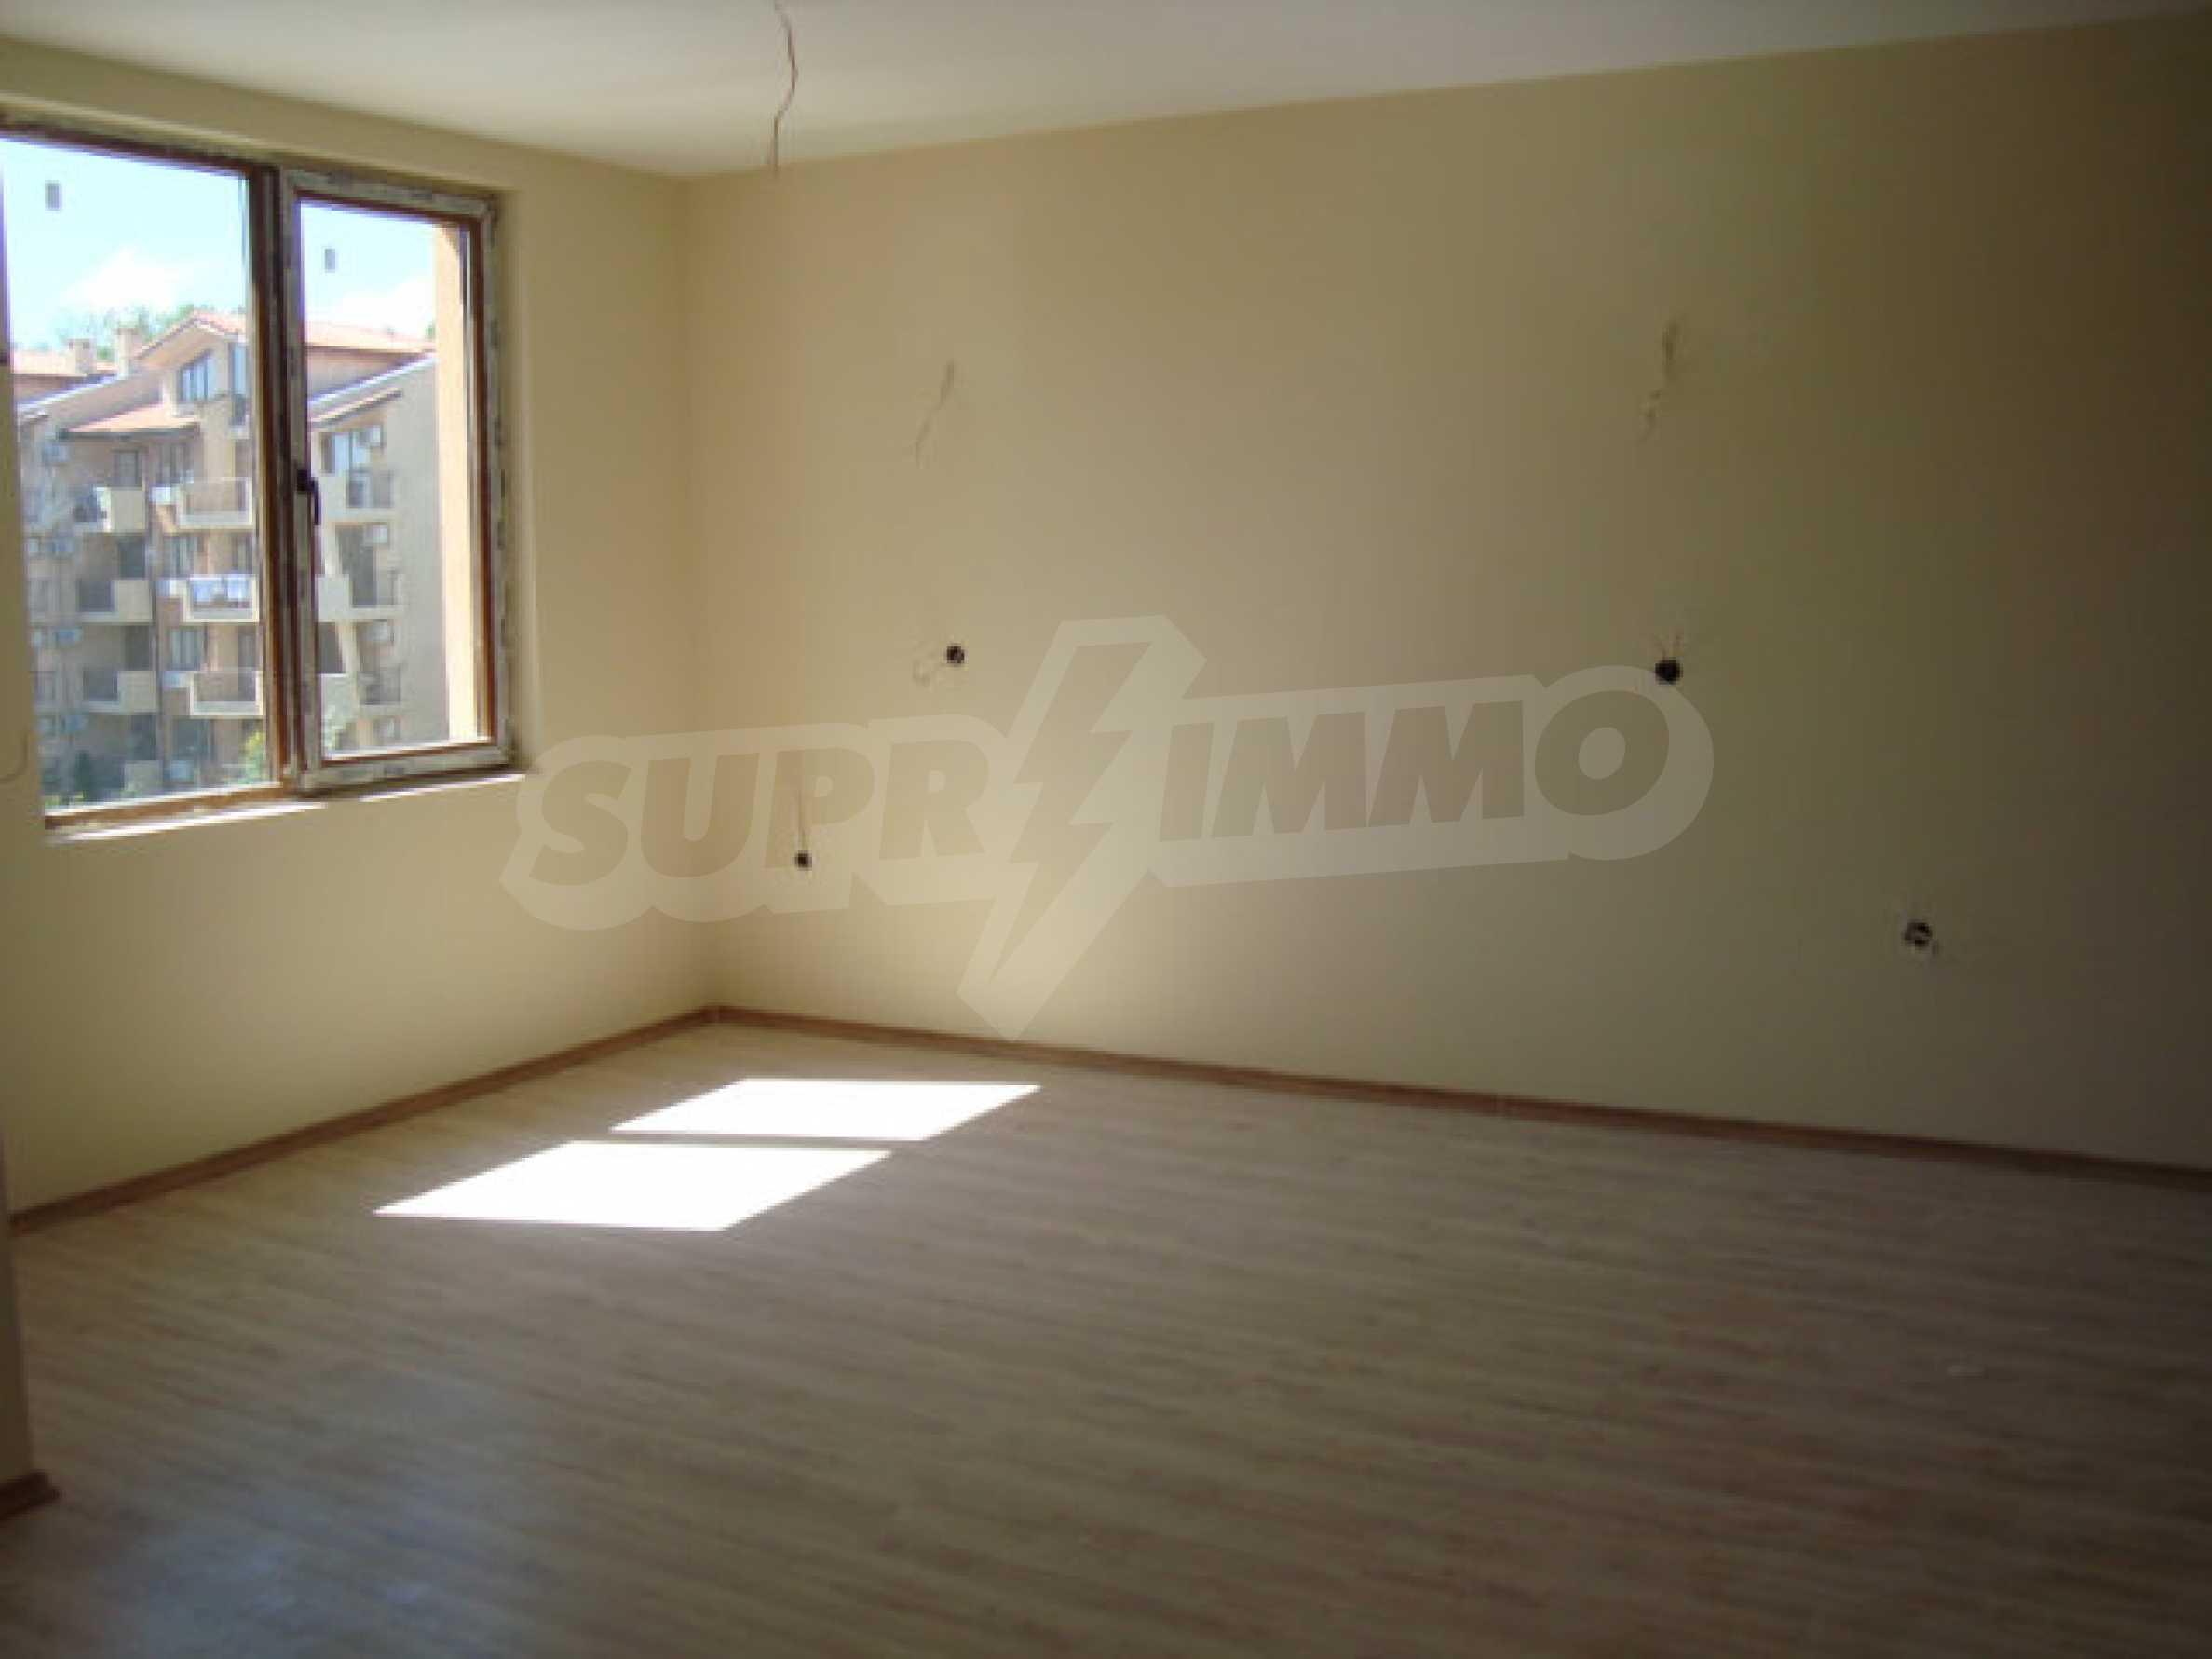 Studios und Apartments im Nestinarka-Komplex in Tsarevo 24